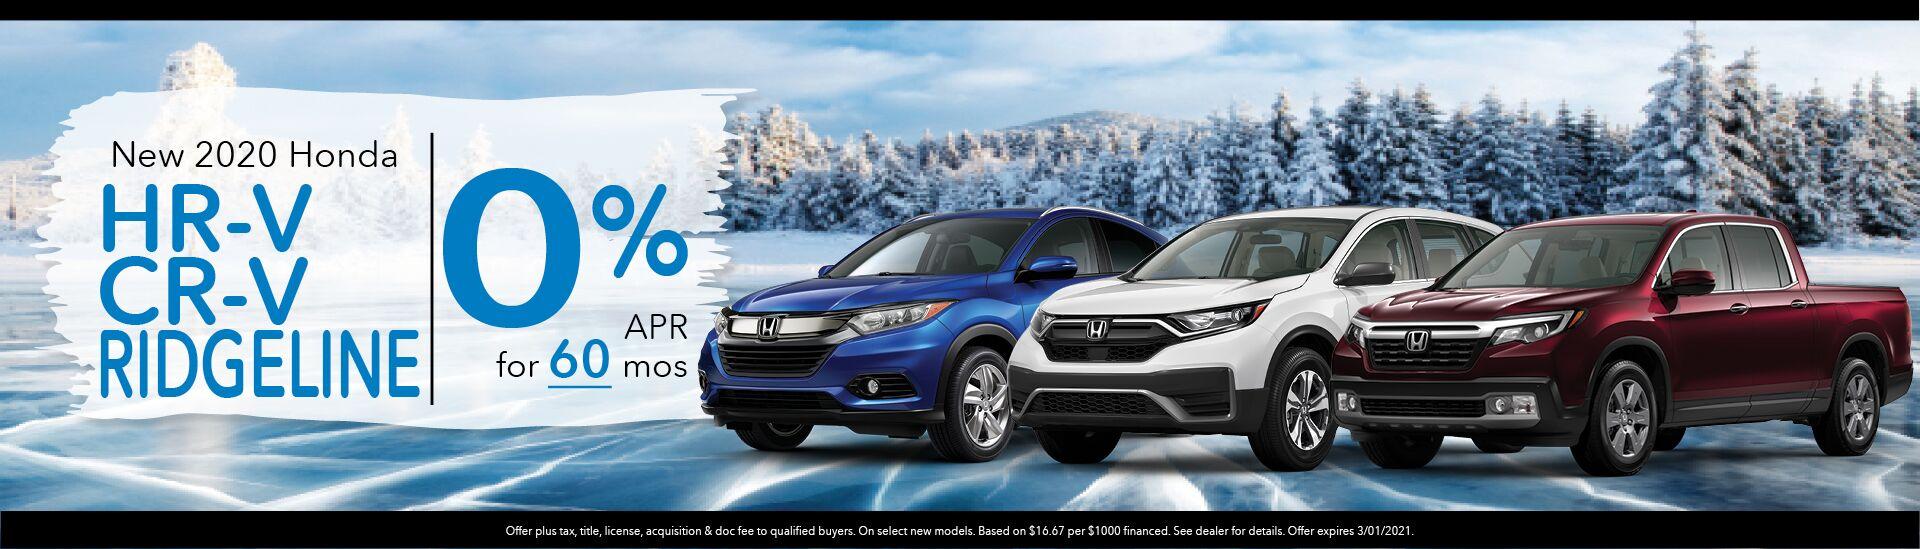 2020 Honda HRV CRV Ridgeline